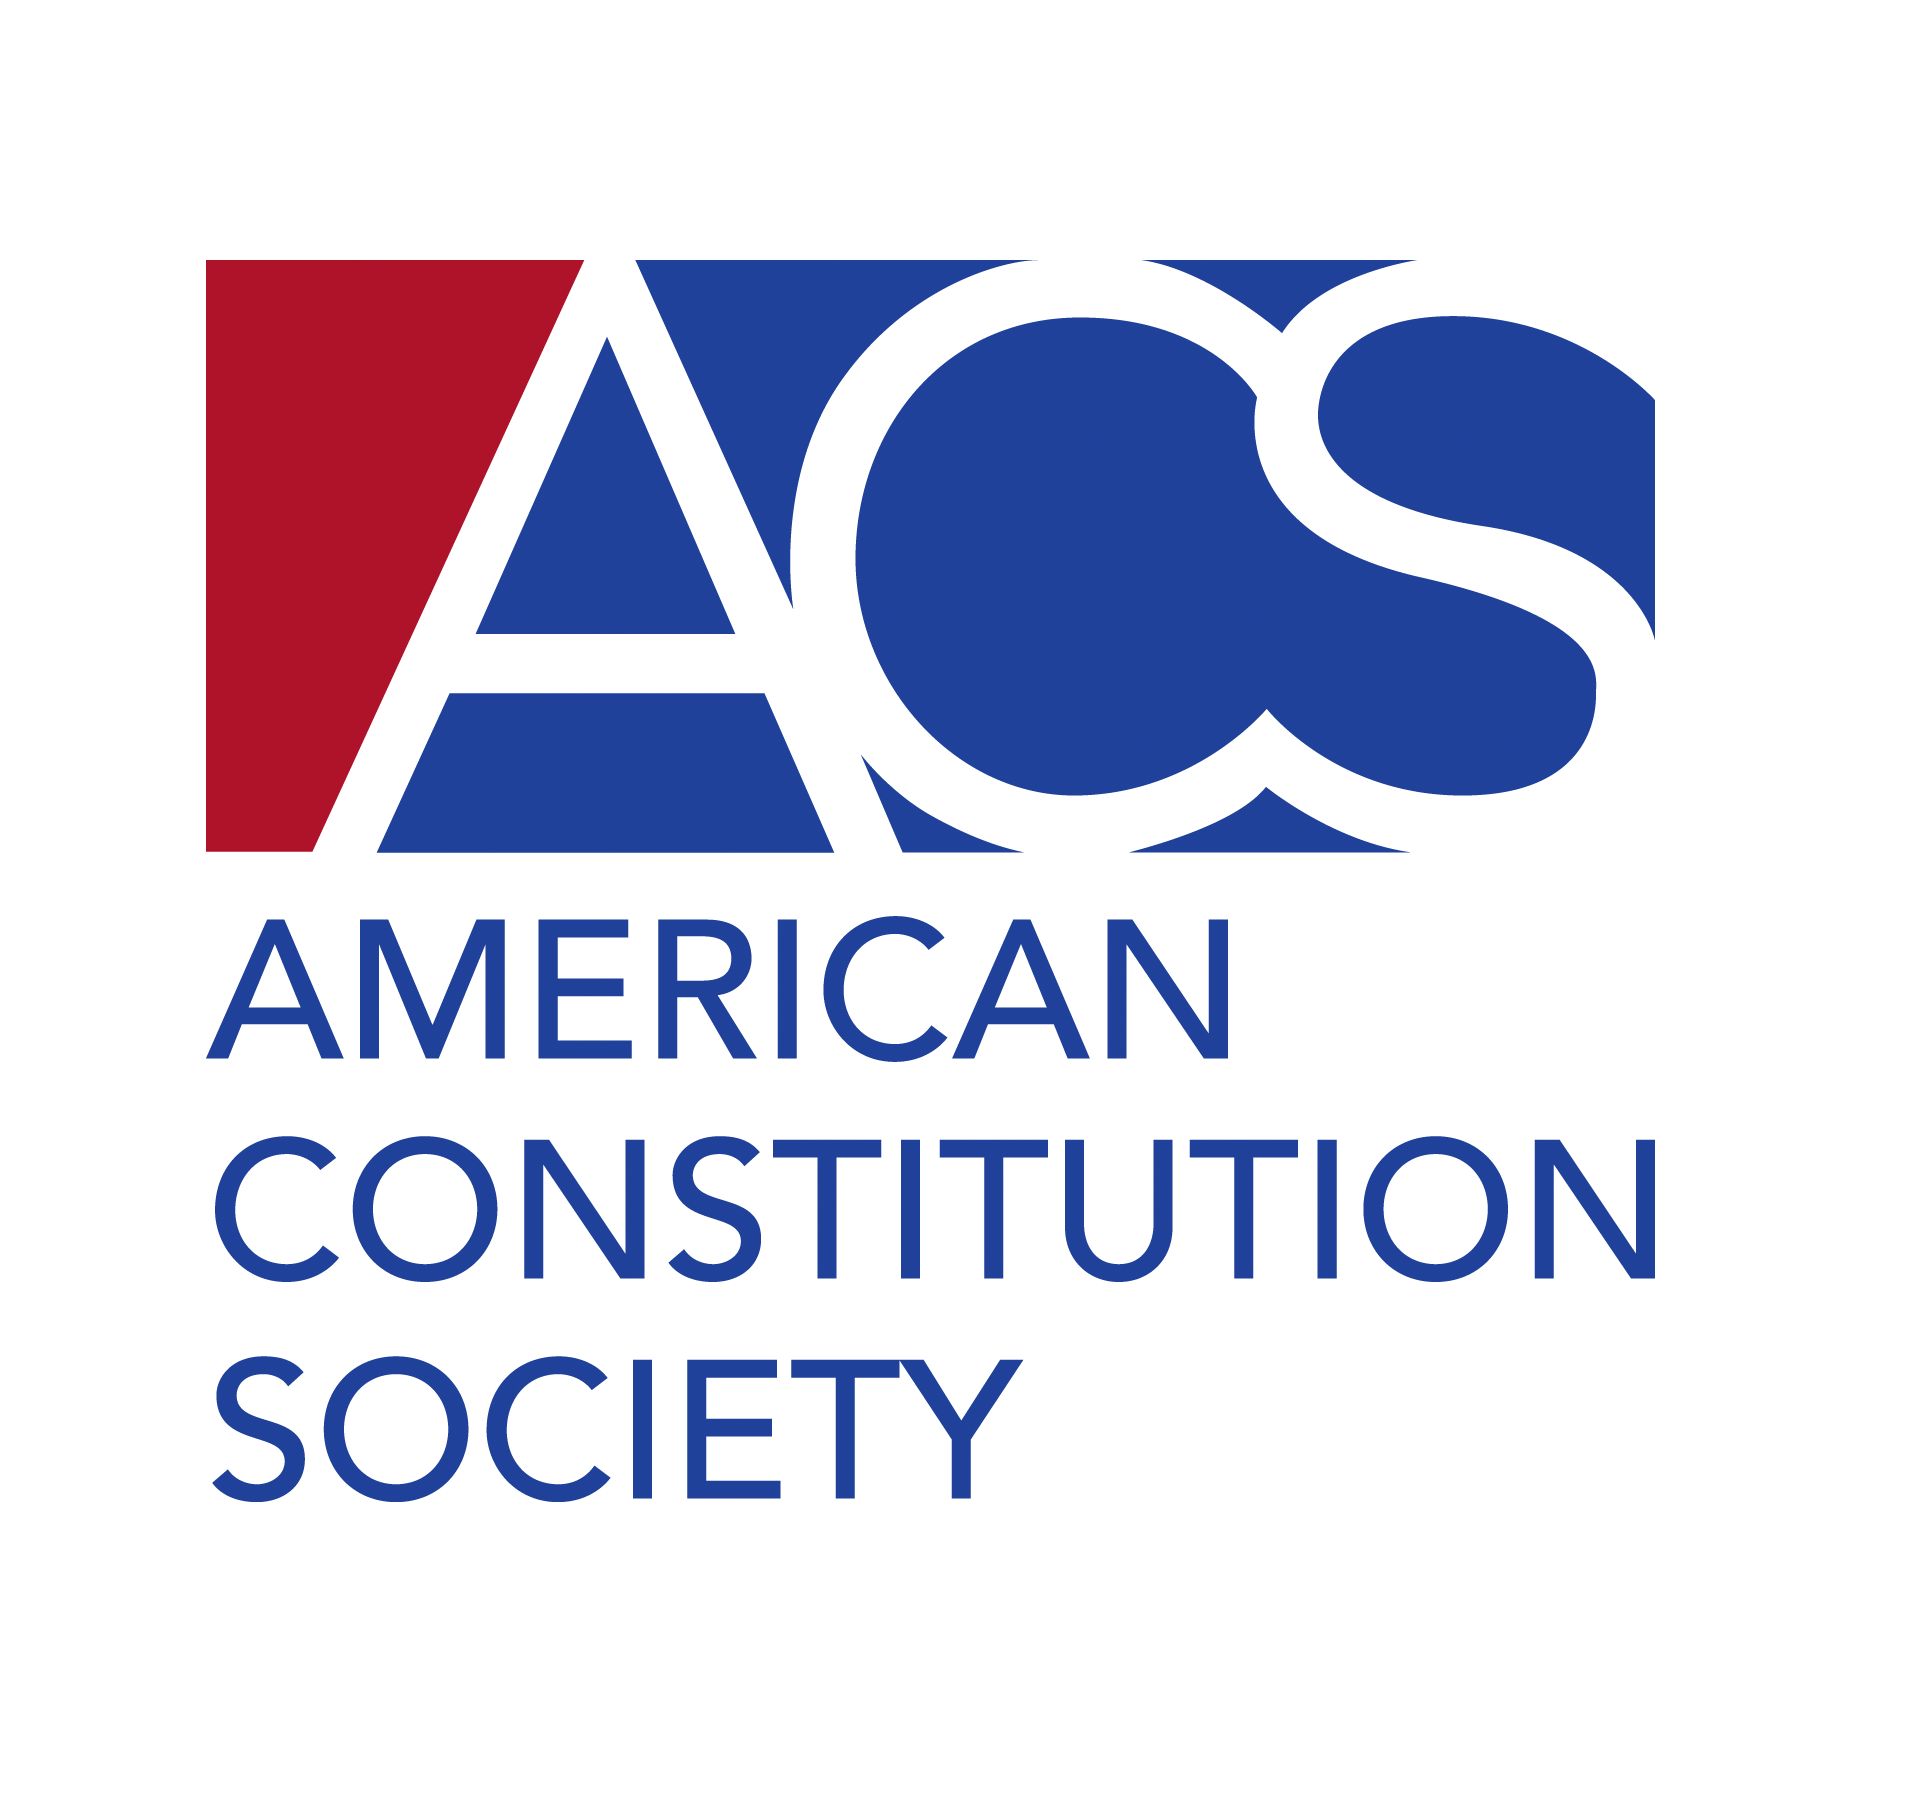 ACS Square color logo